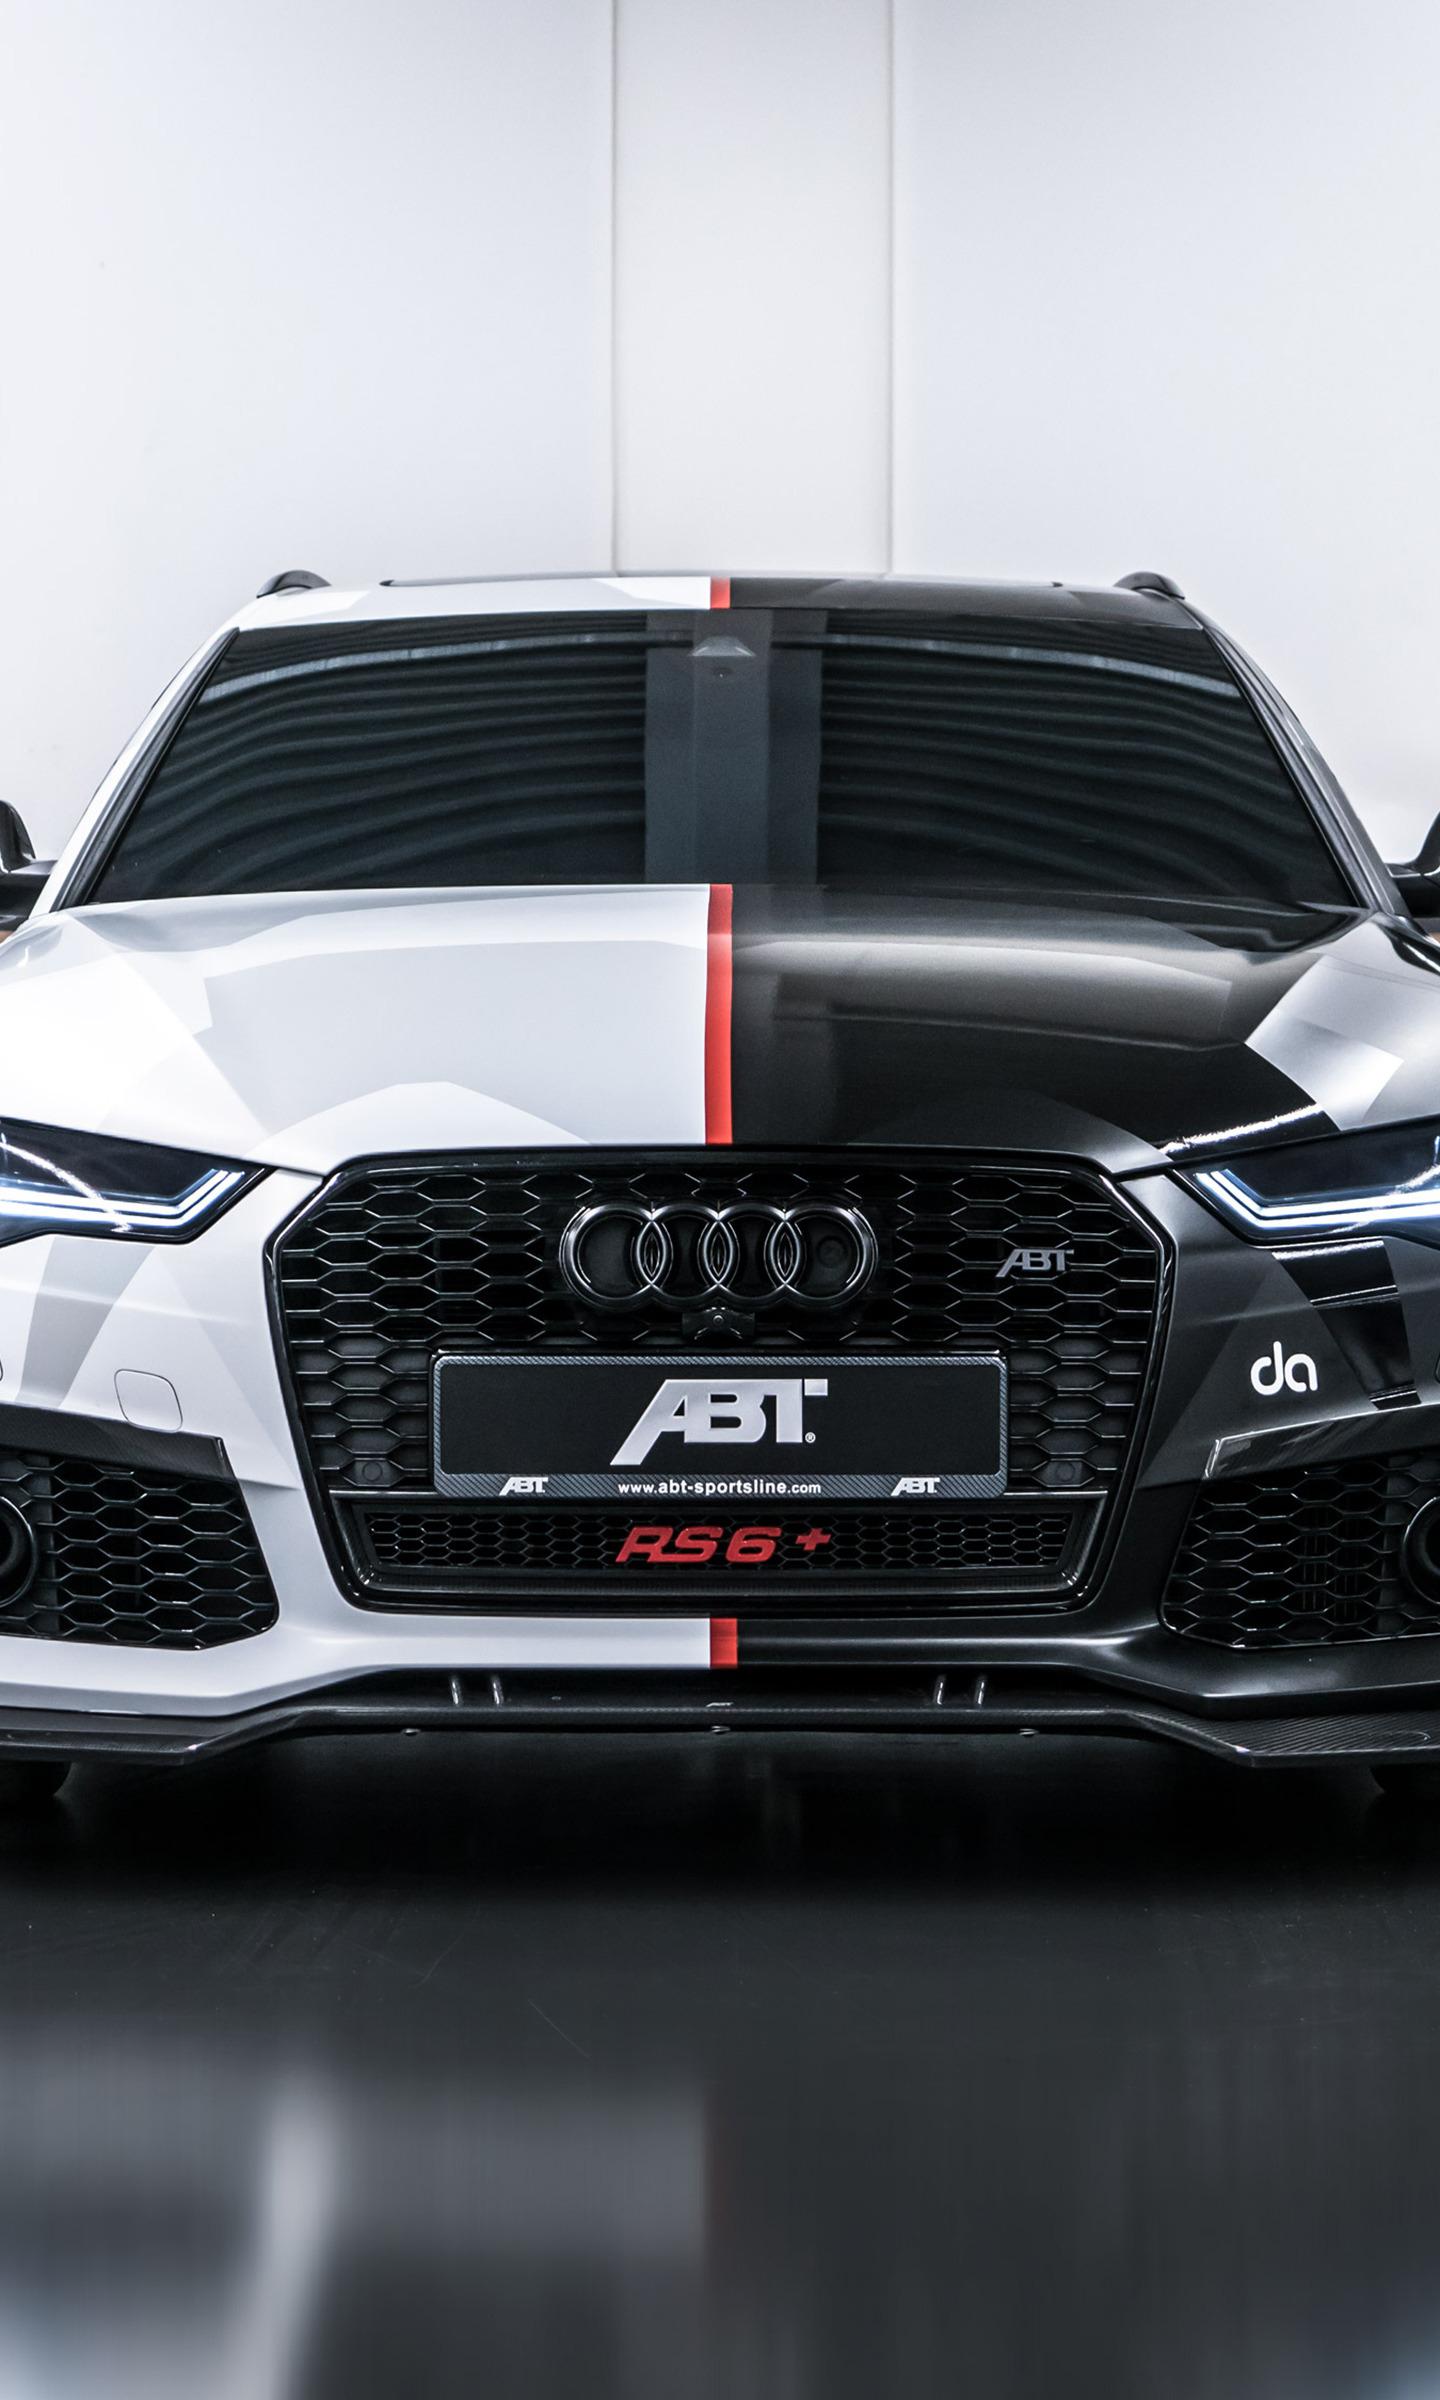 Download X Wallpaper Abt Audi Rs Avant Jon Olsson - Abt samsung